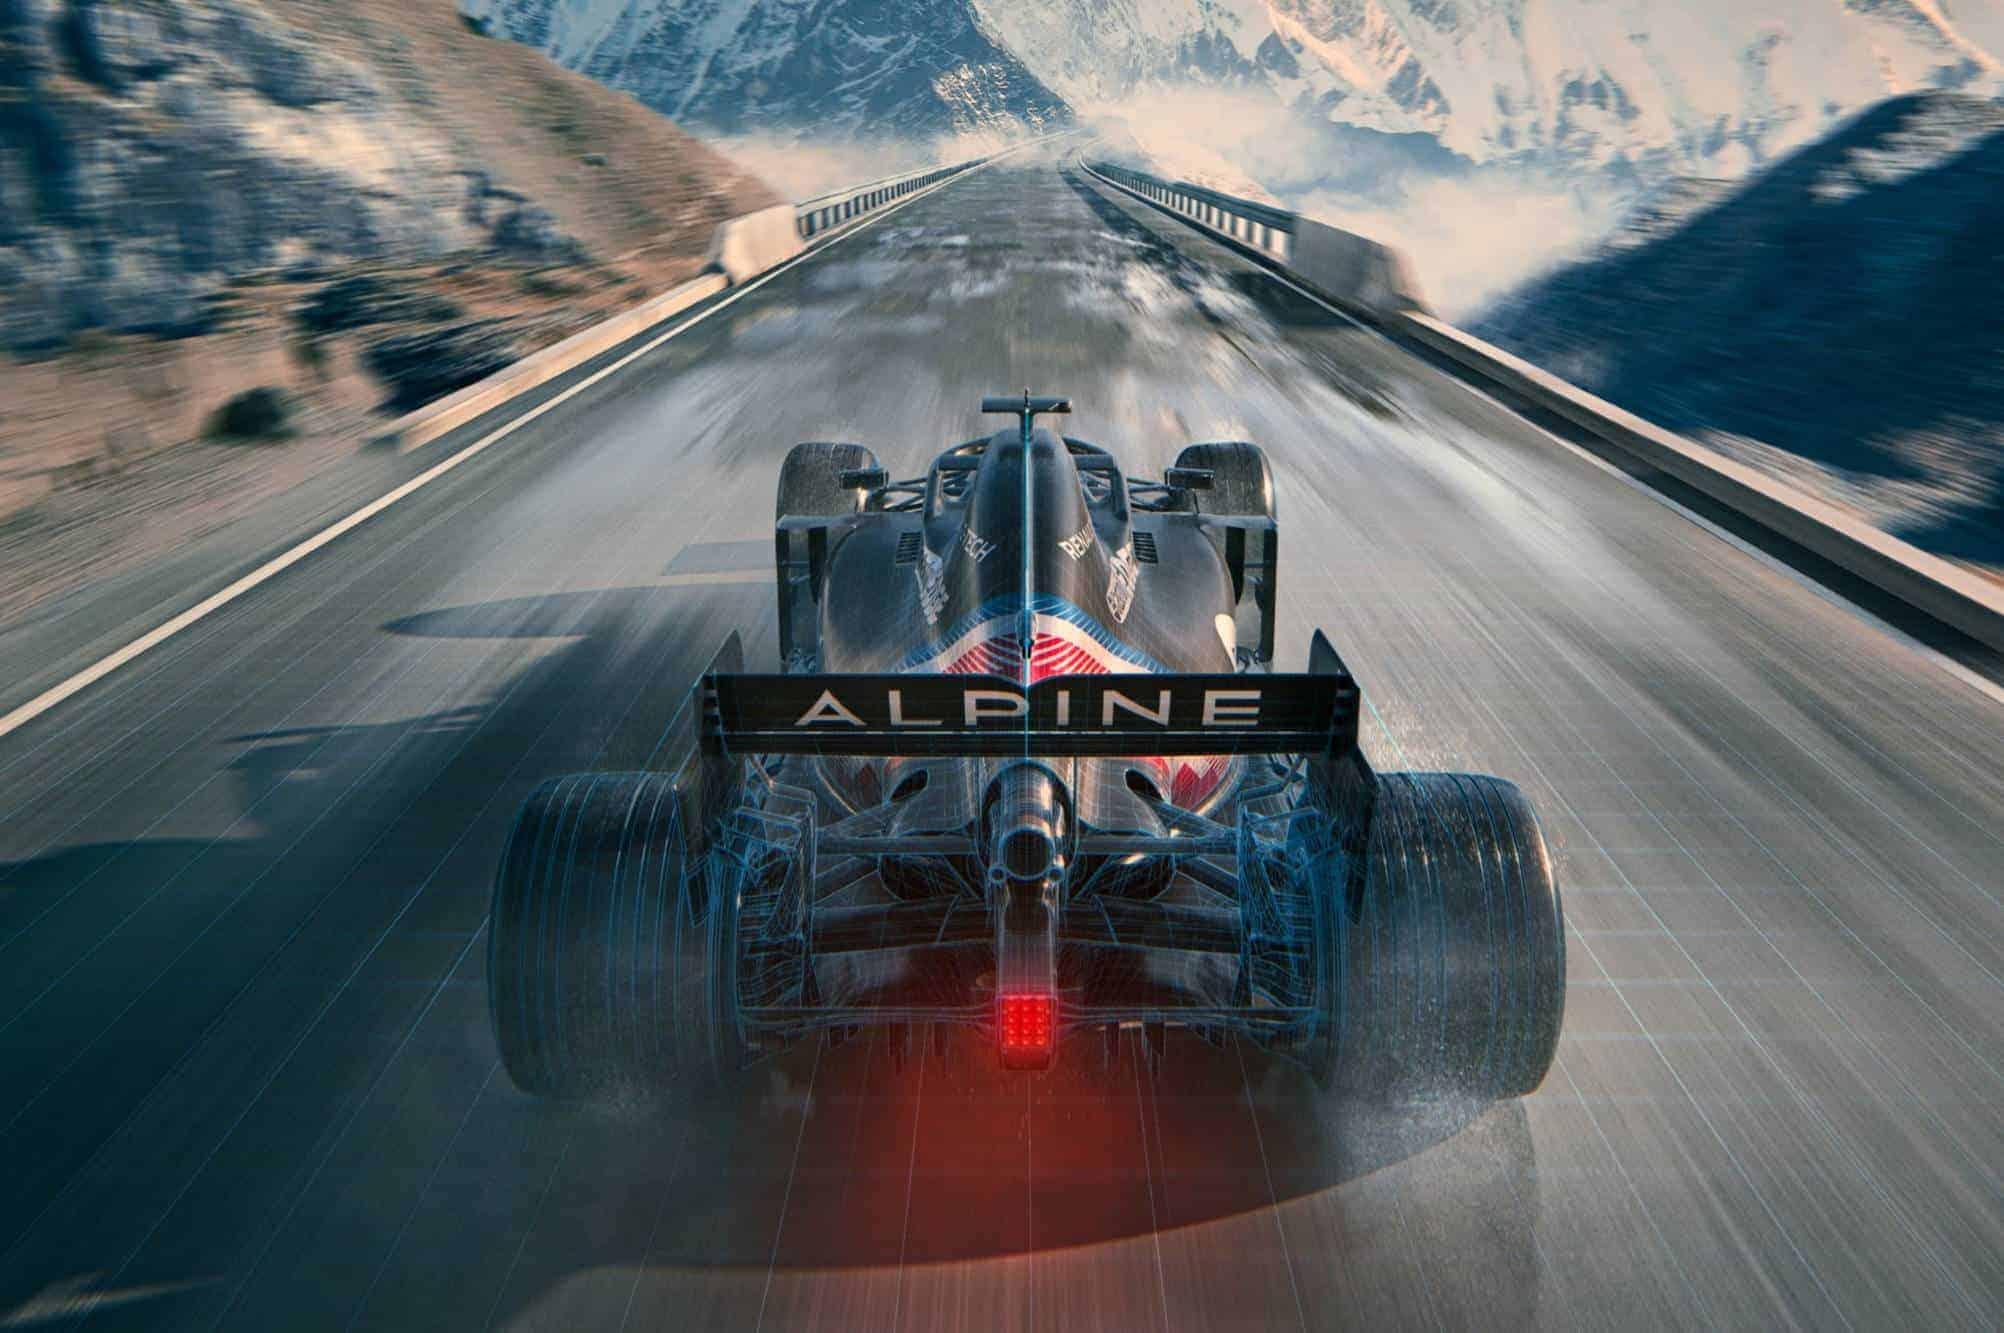 2021 Alpine F1 livery launch 3 Photo Renault Alpine Twitter